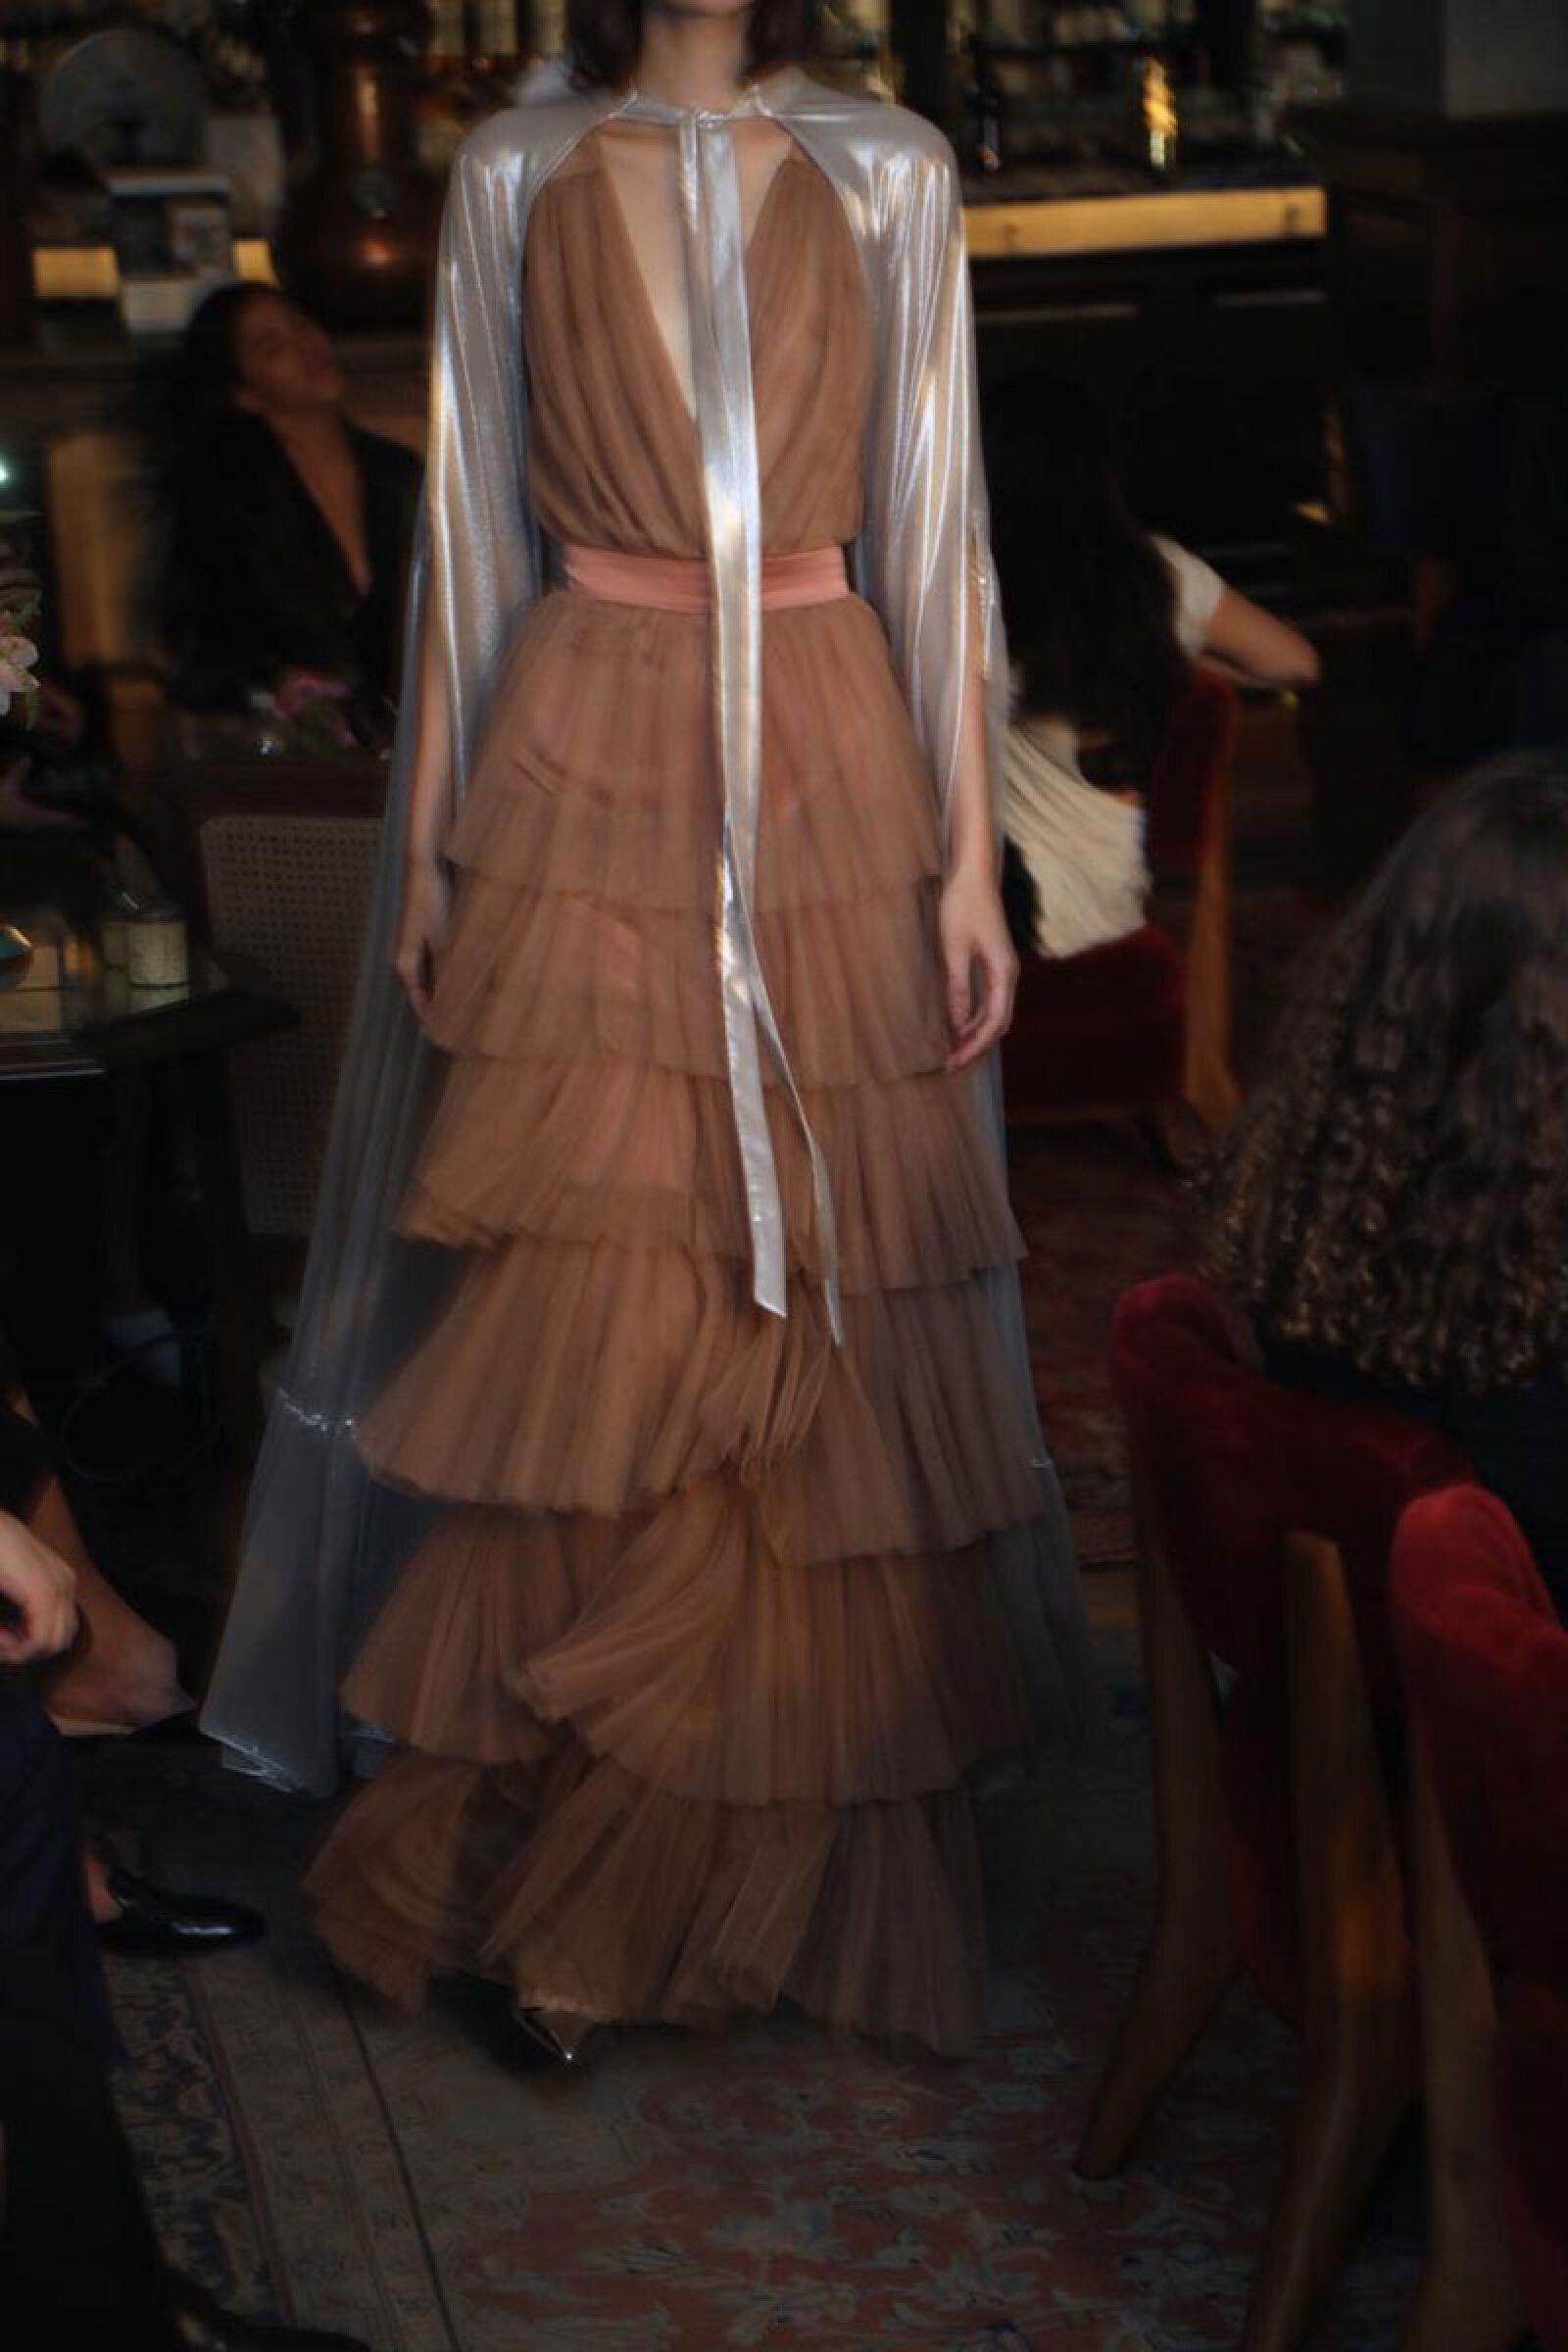 Sandra-Weil-MBFWMX-Runway-Nude-Dress